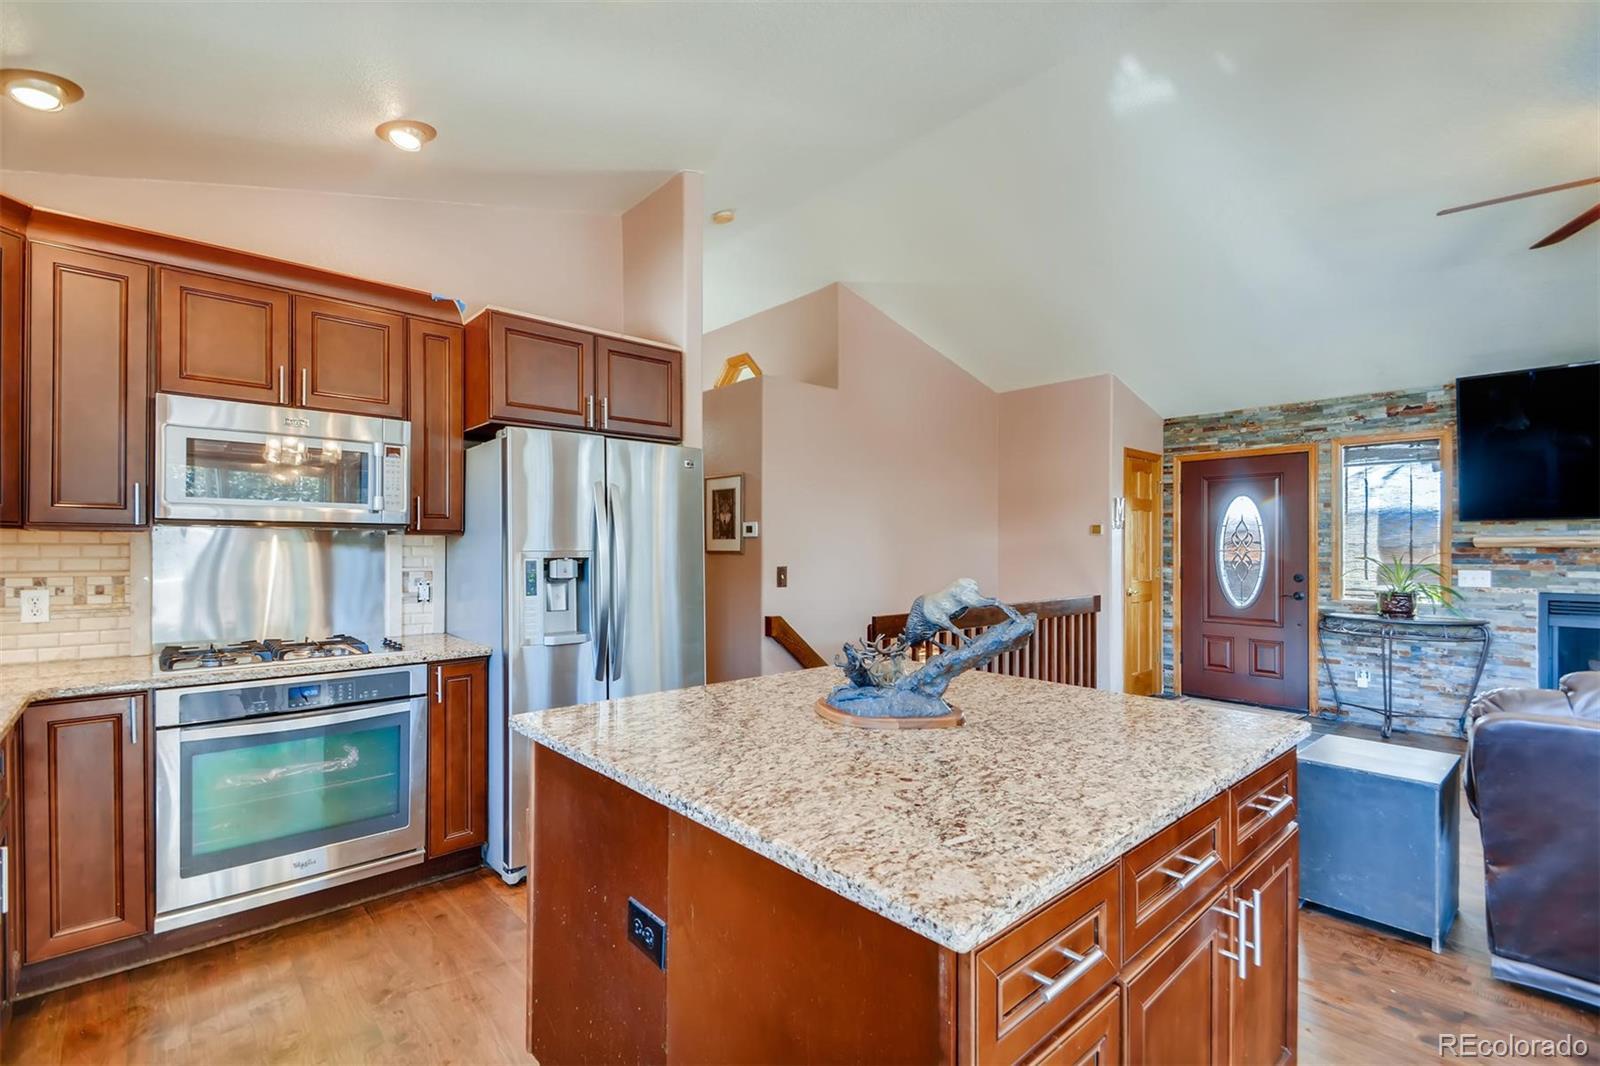 MLS# 8127847 - 4 - 515 Gold Flake Terrace, Bailey, CO 80421